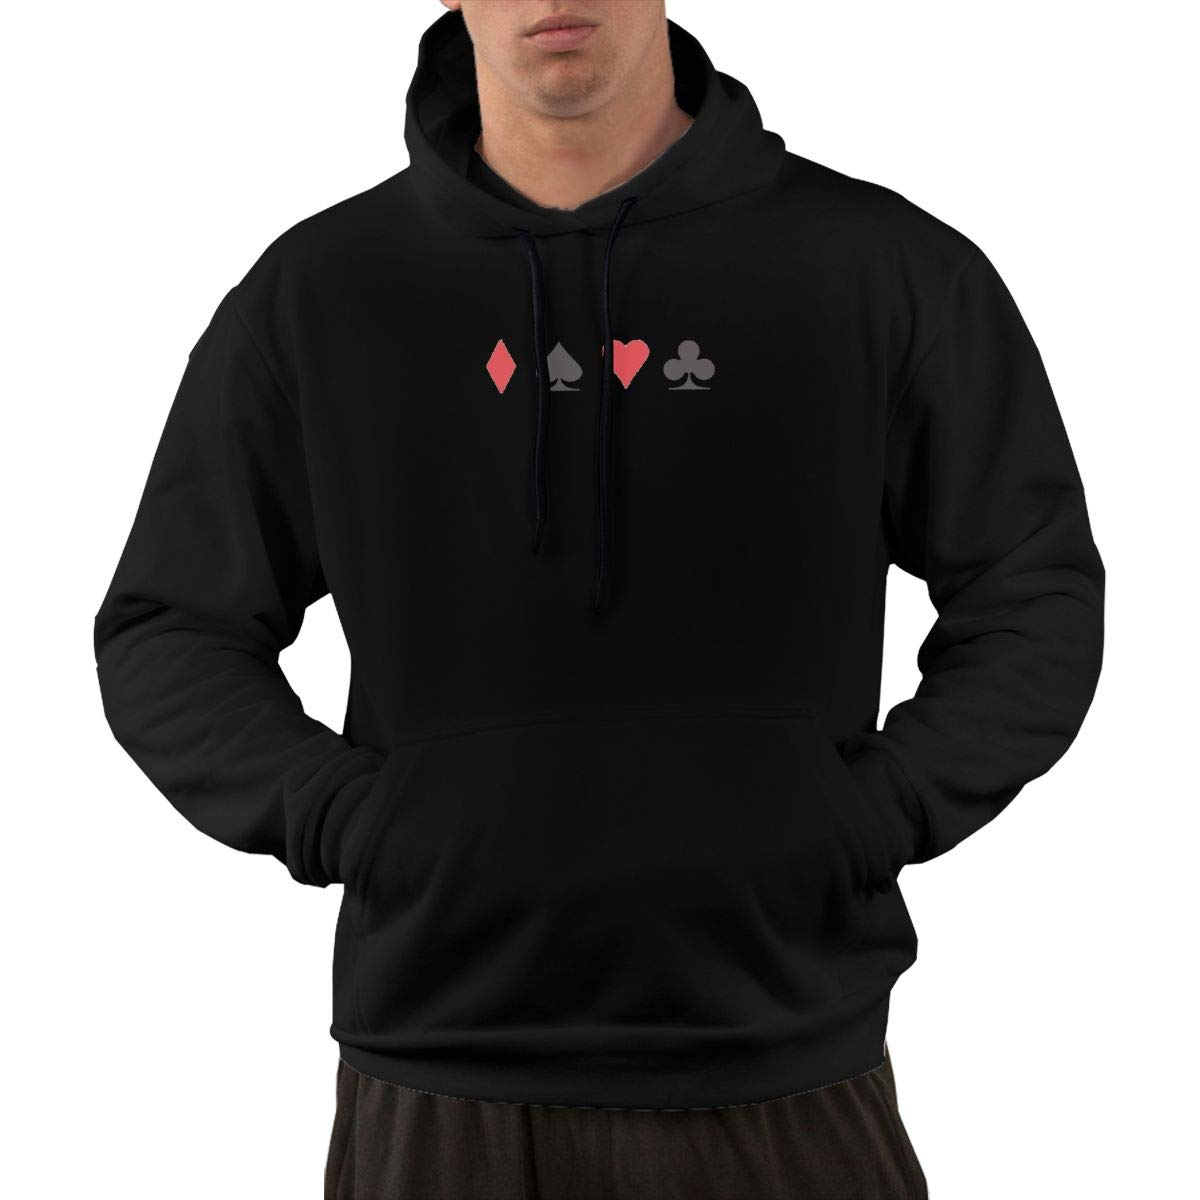 Poker Logo Hoodie Mens Fashion Casual Workout Sweatshirts Athletic Sweatshirt with Front Pocket